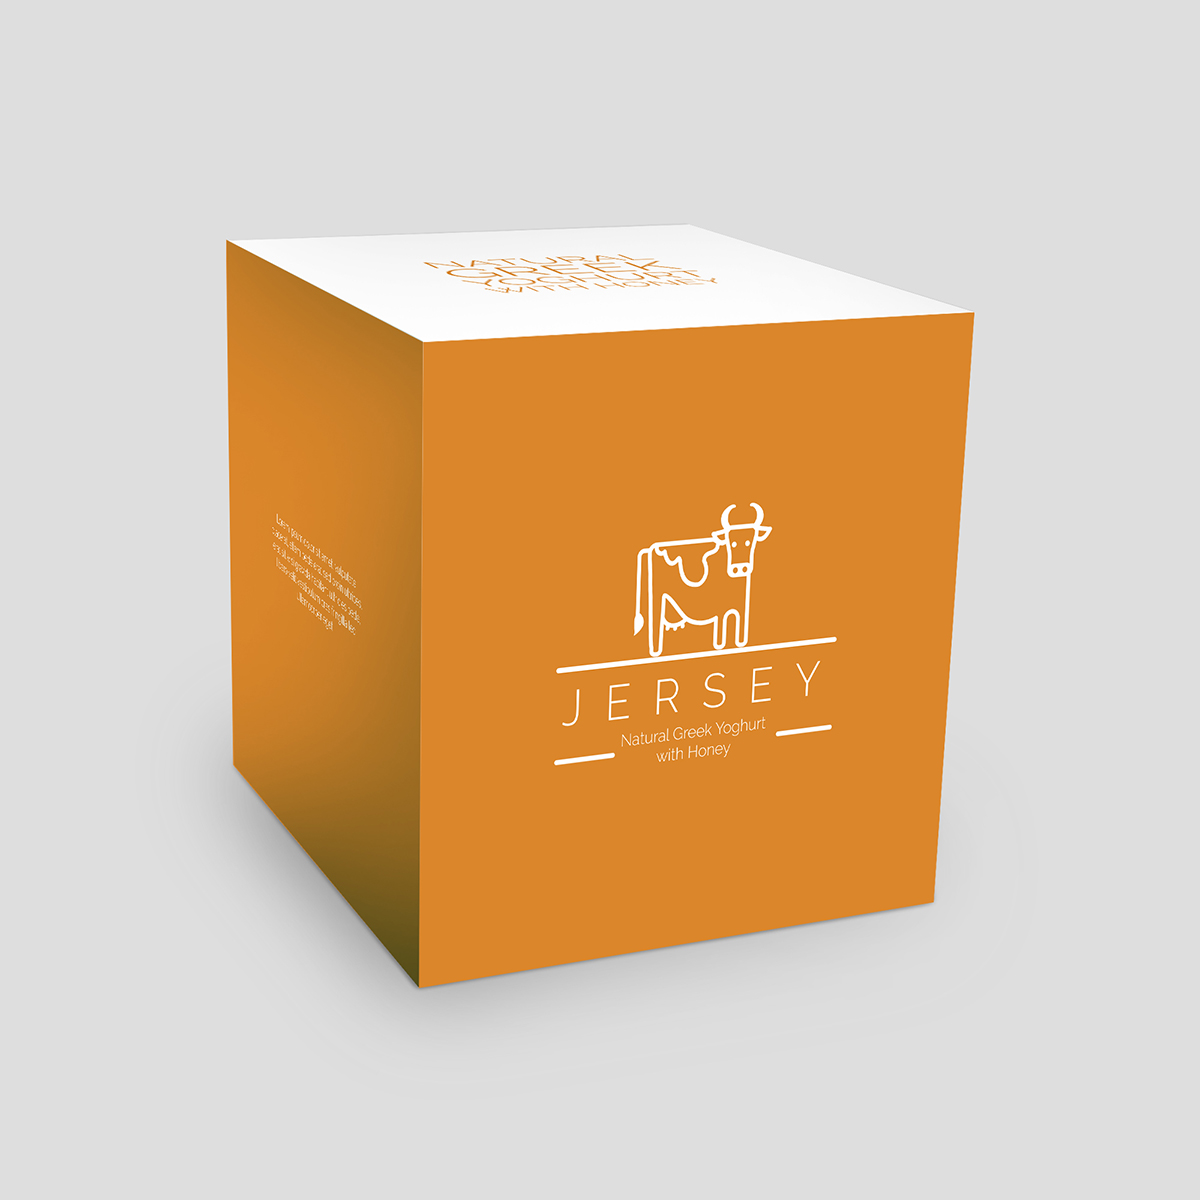 Elegant spielerisch it company verpackungs design for for Australian design firms